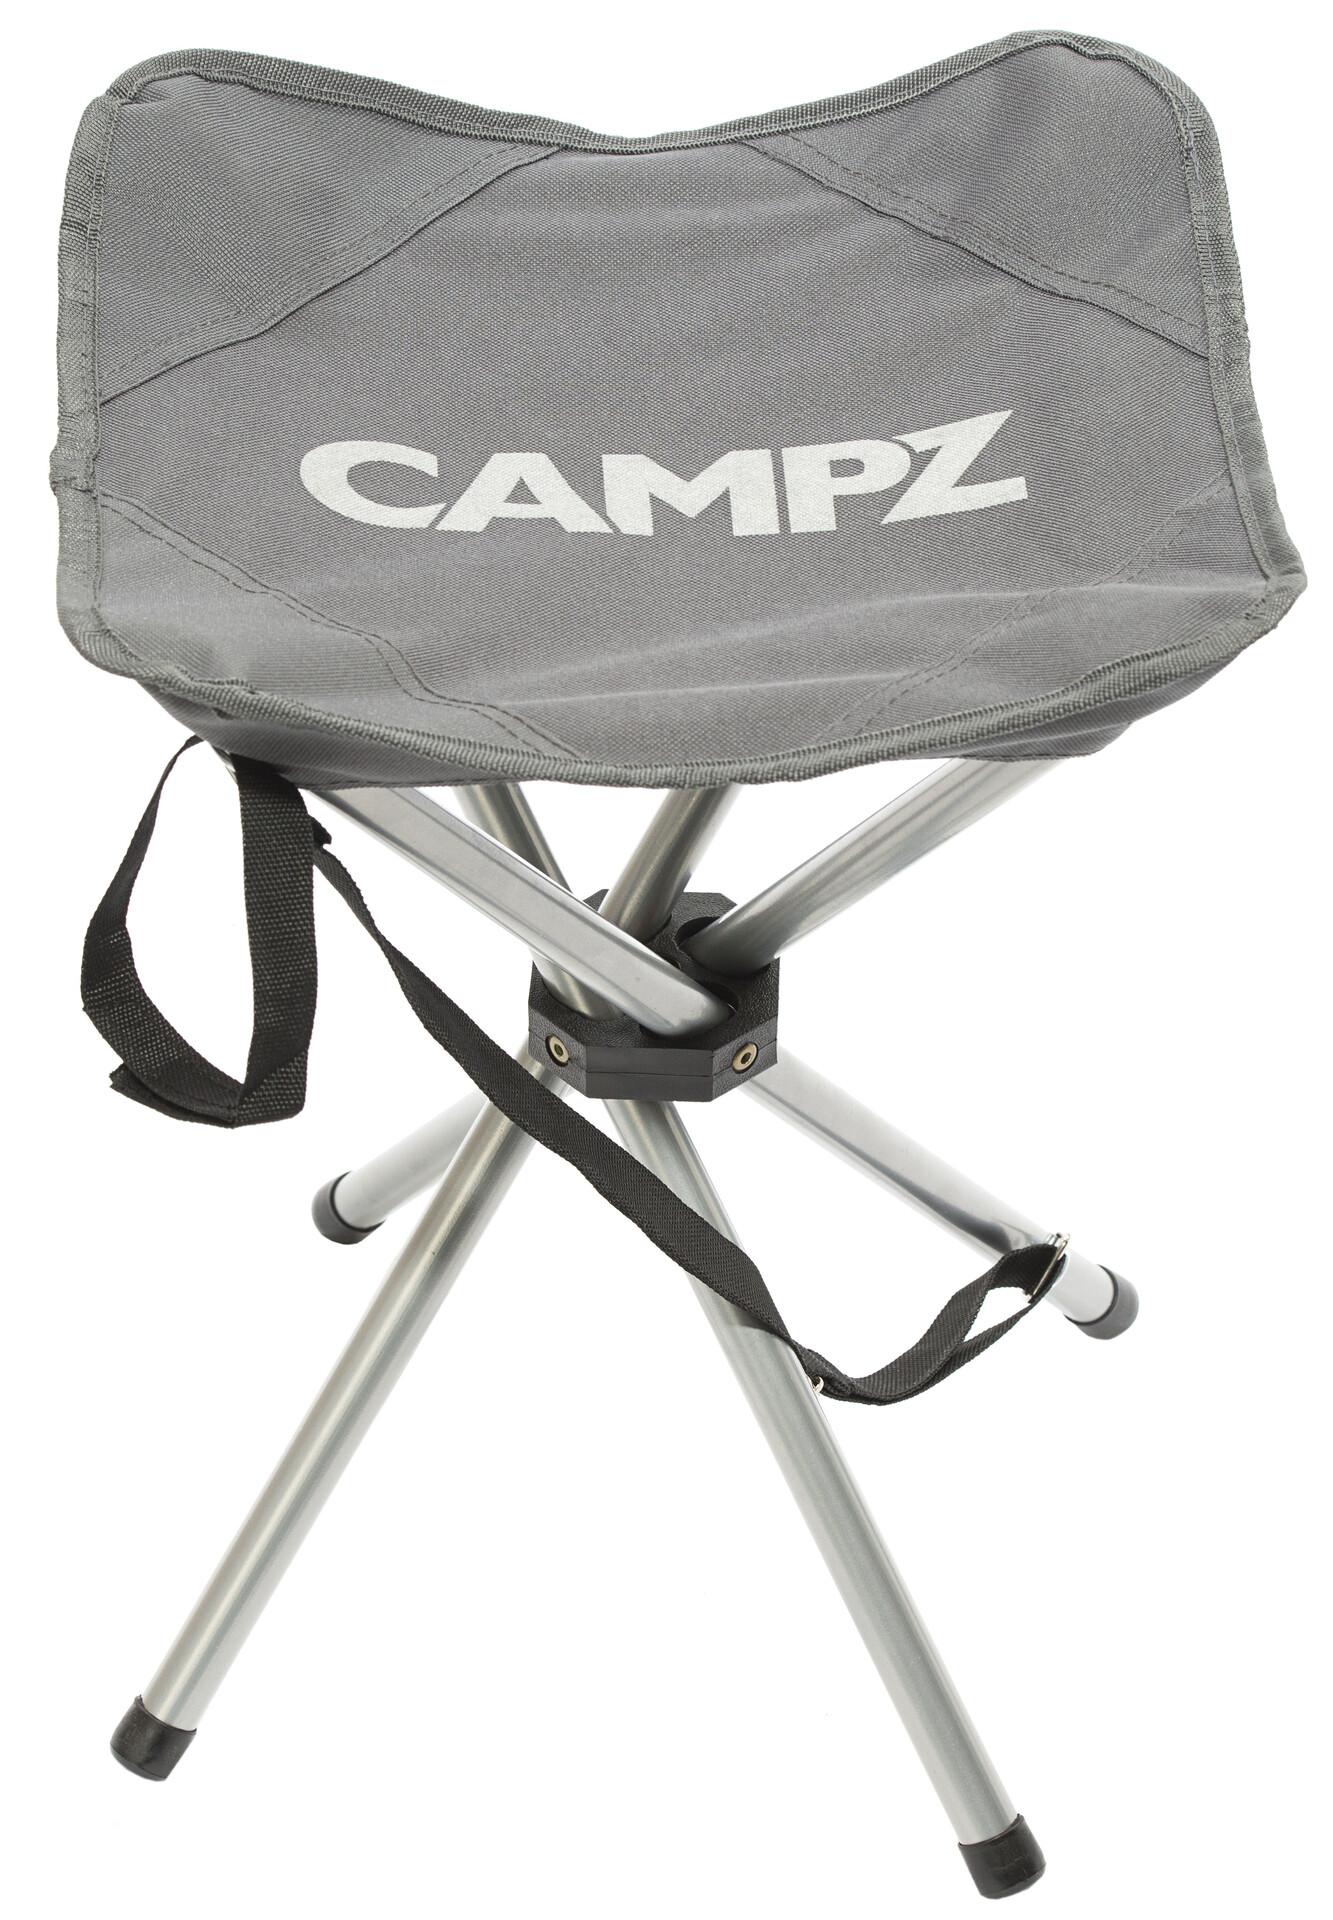 CAMPZ CAMPZ CAMPZ 4Legs Stool (2019) 1d4a40